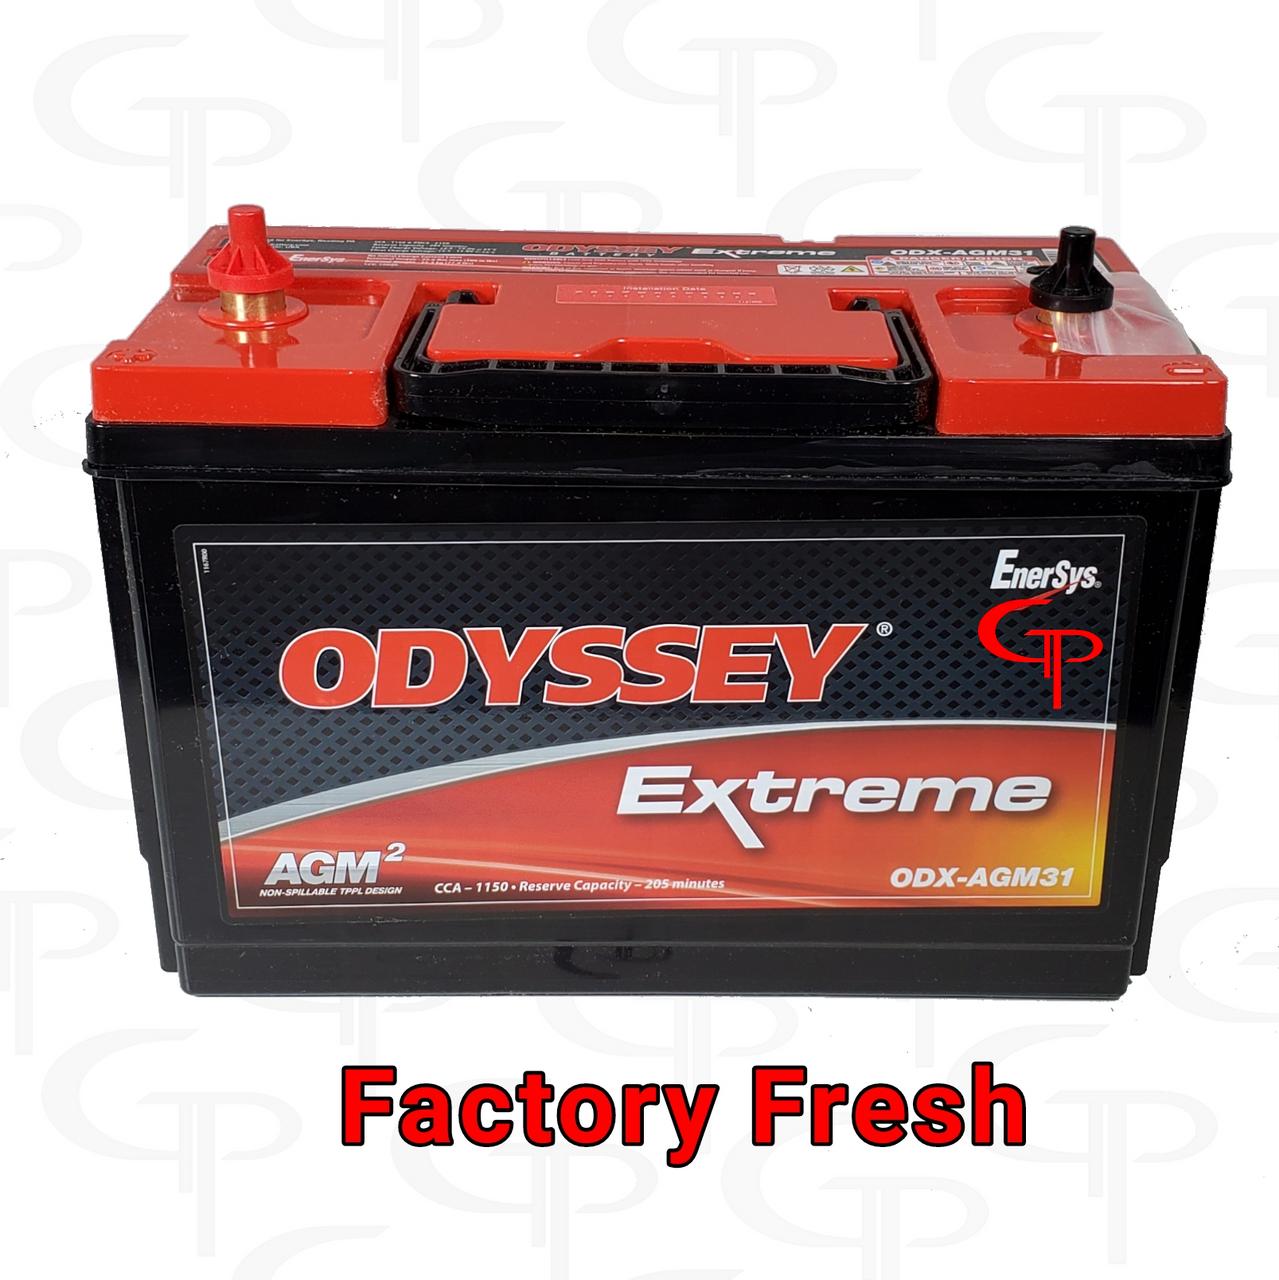 Odyssey Extreme ODX AGM31 (same battery as Northstar Pro AGM31)